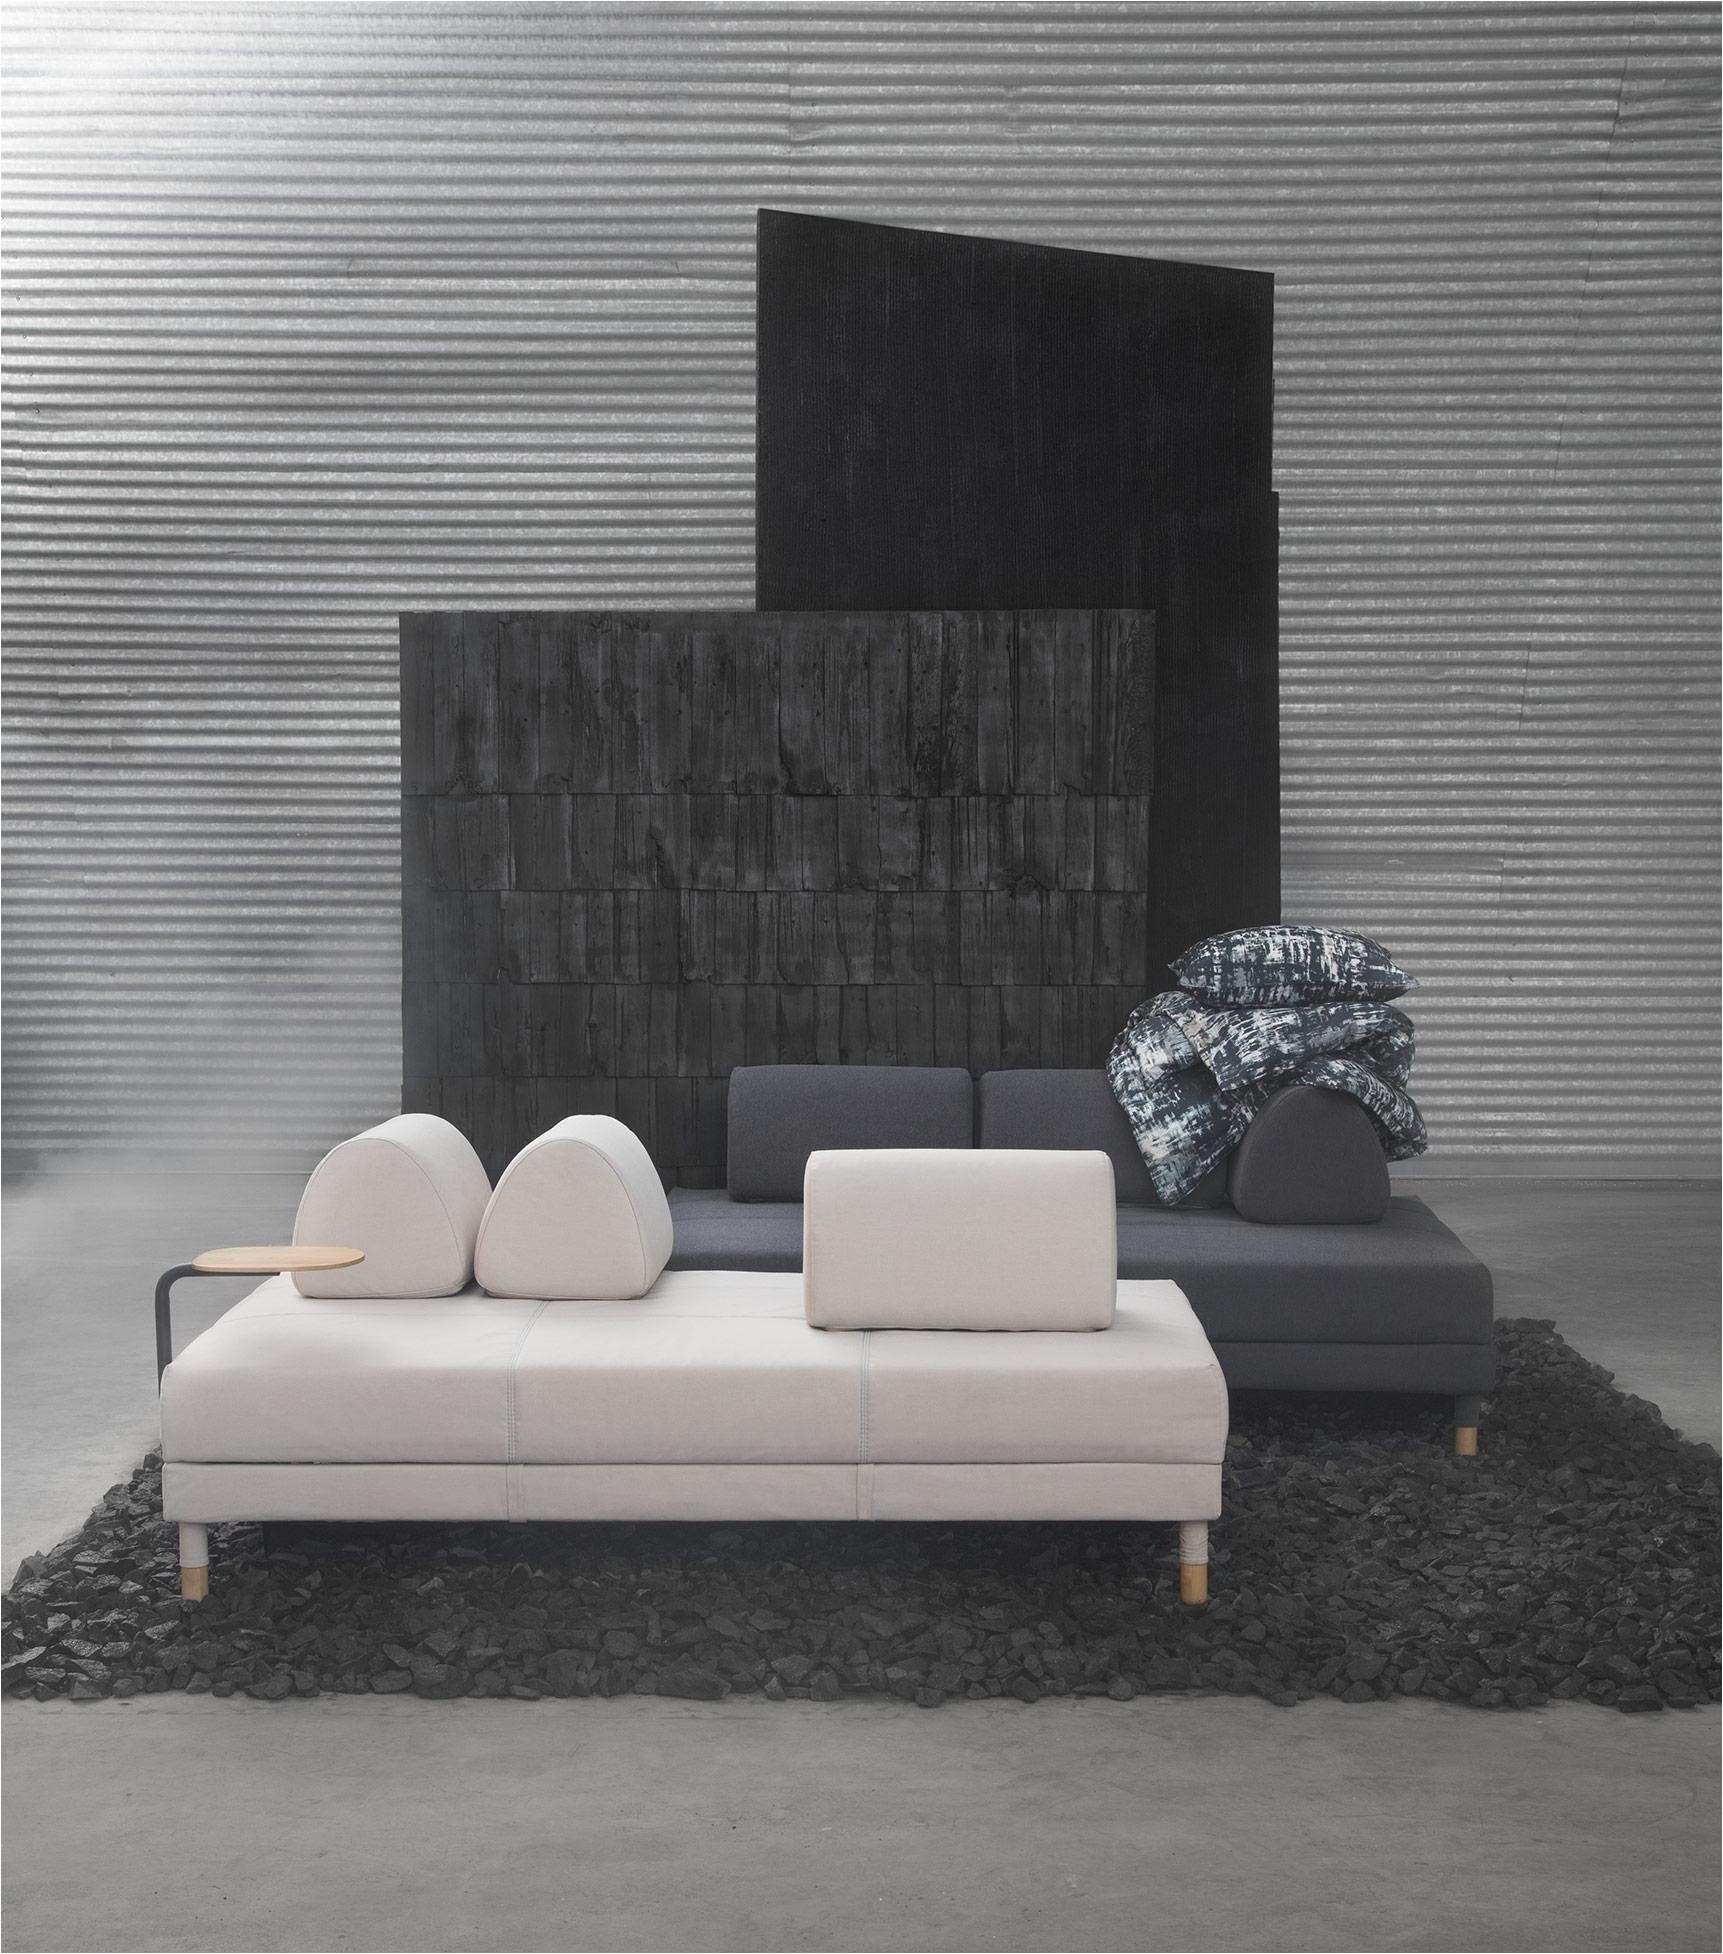 Gray Bathroom Ideas Interior Design Inspirational Ikea Small Home Plans Inspirational Ikea Bathroom 0d Scheme Design